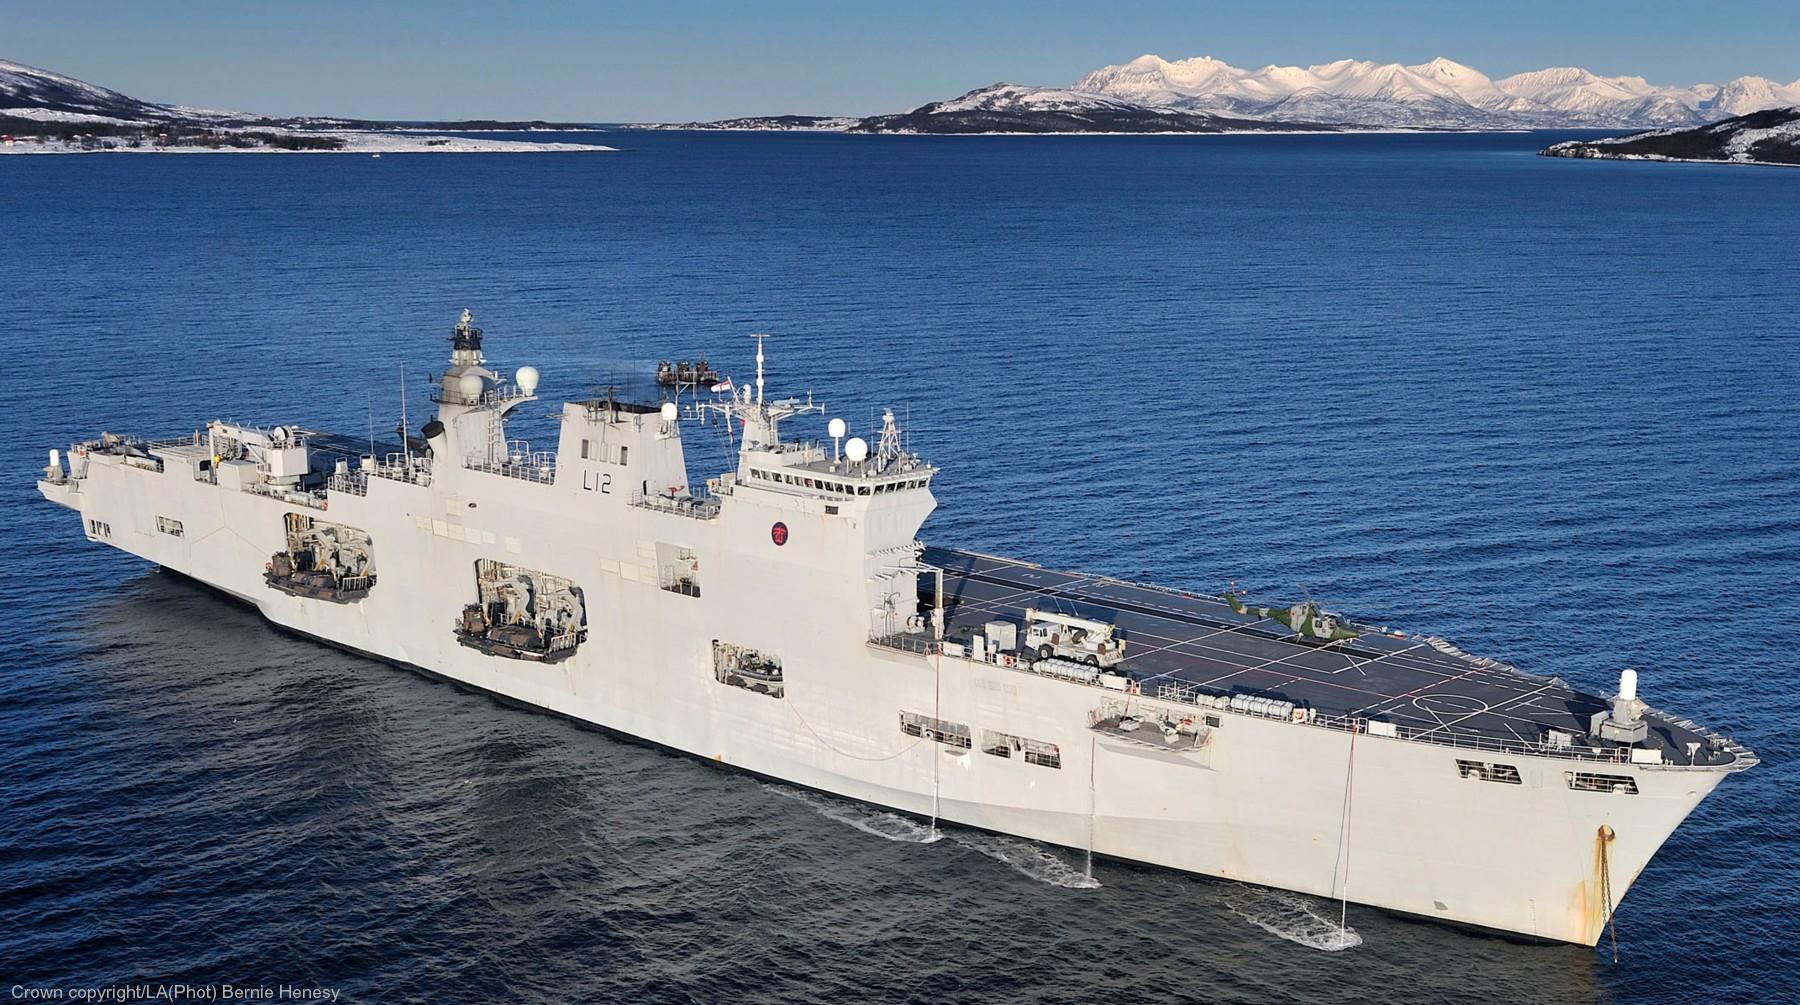 Porta-Helicópteros Multipropósito (PHM) Atlántico - A140 L-12-HMS-Ocean-012